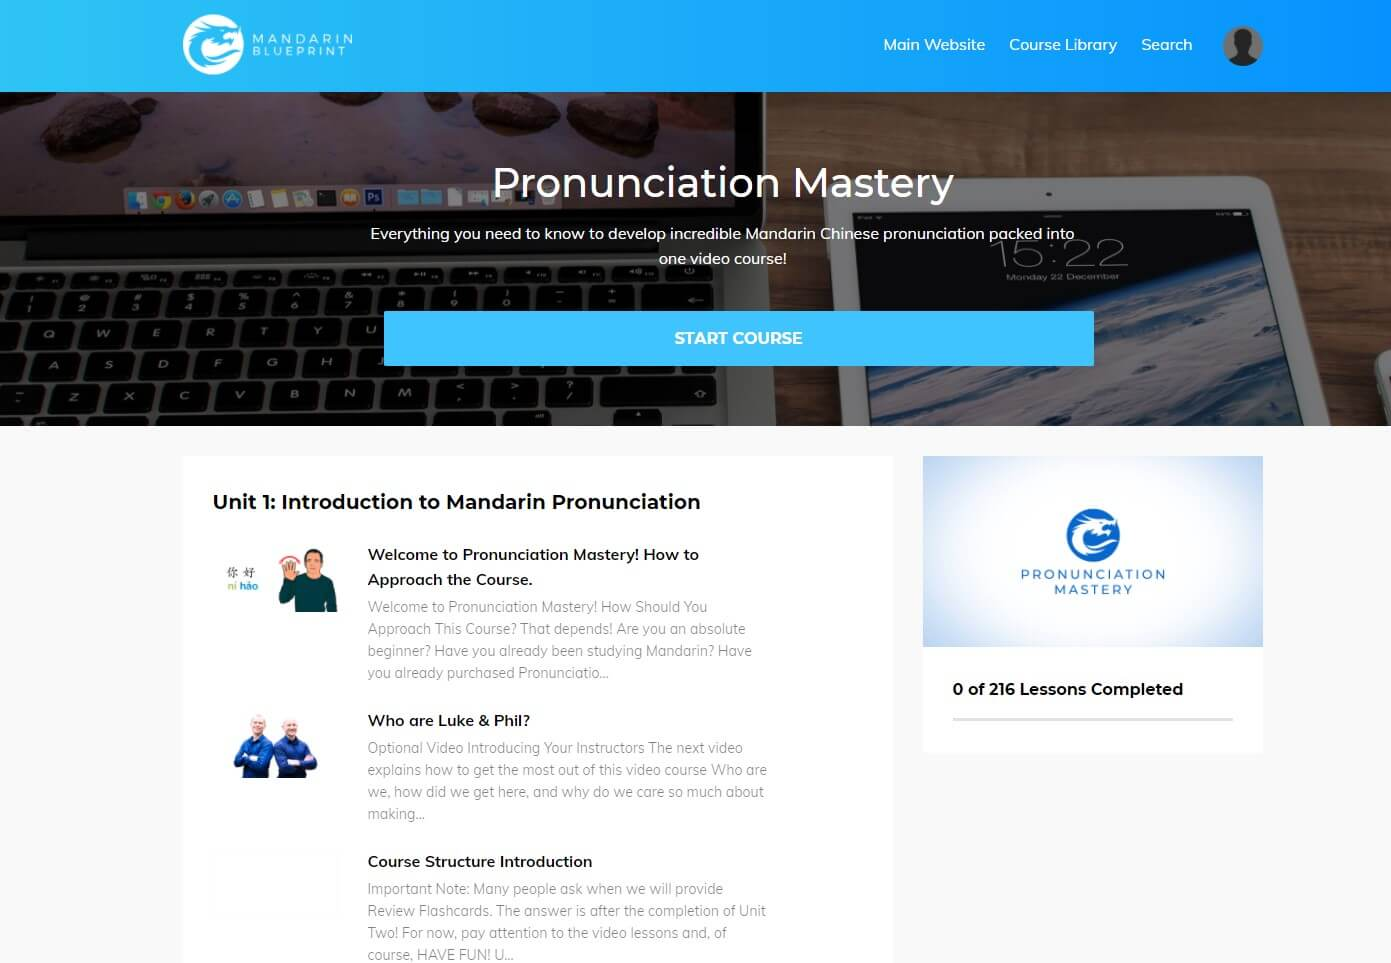 Mandarin Blueprint - Pronunciation Mastery